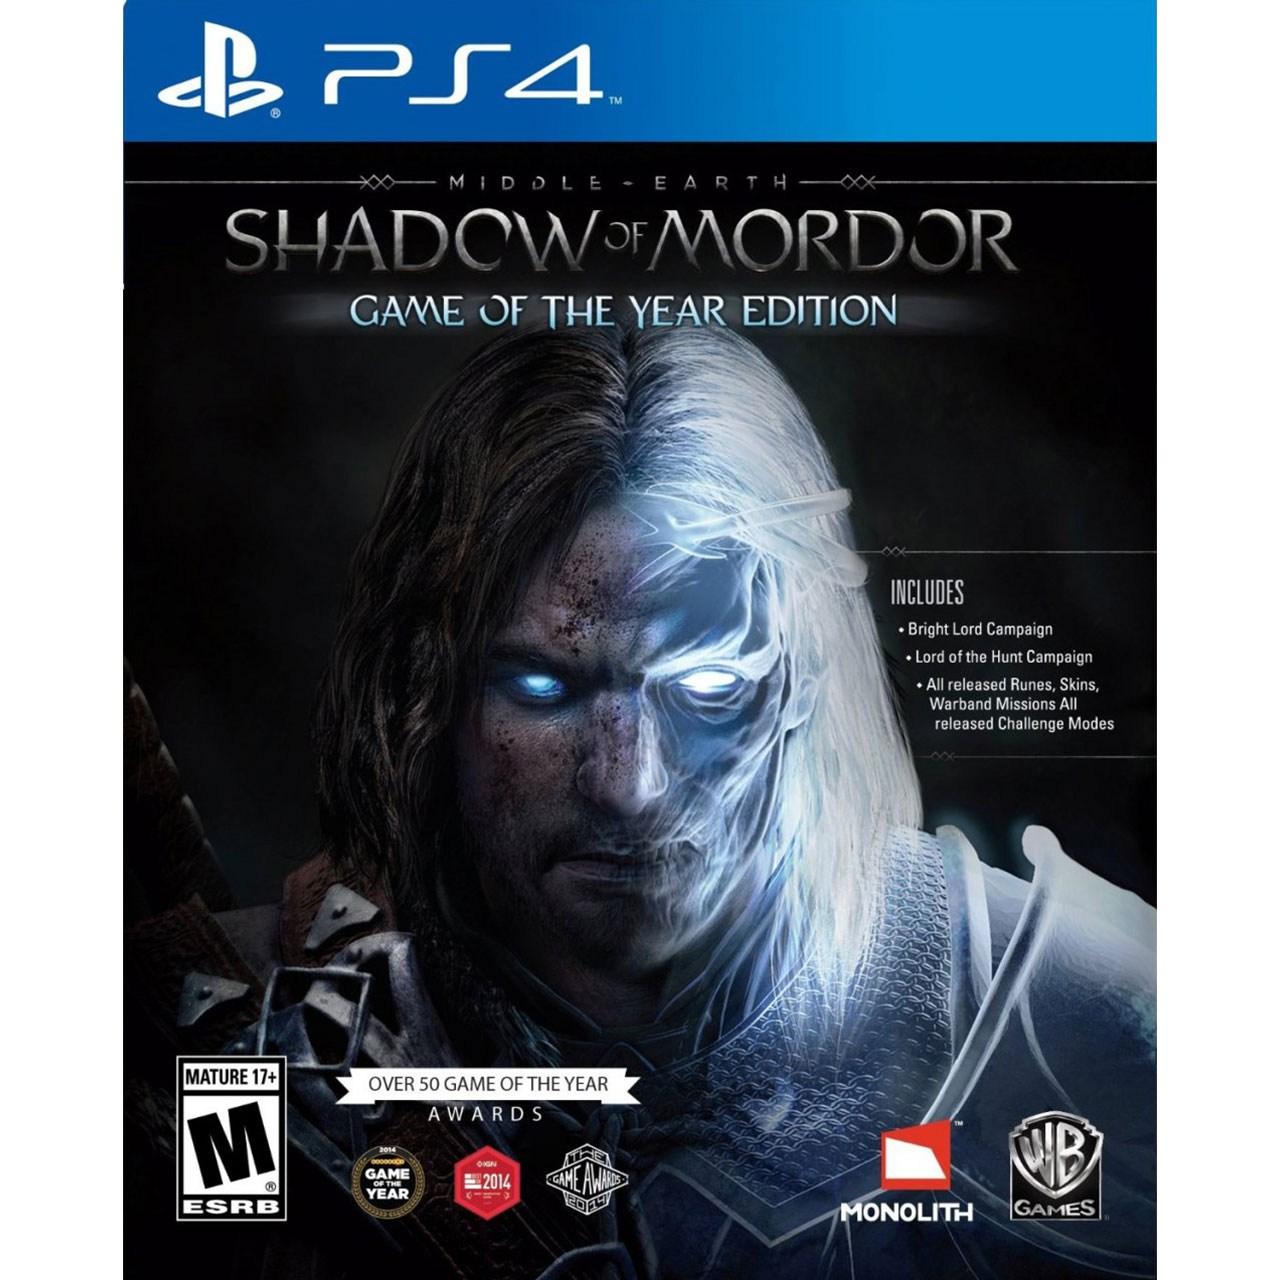 بازی Shadow of Mordor: Game of the Year Edition مخصوص PS4